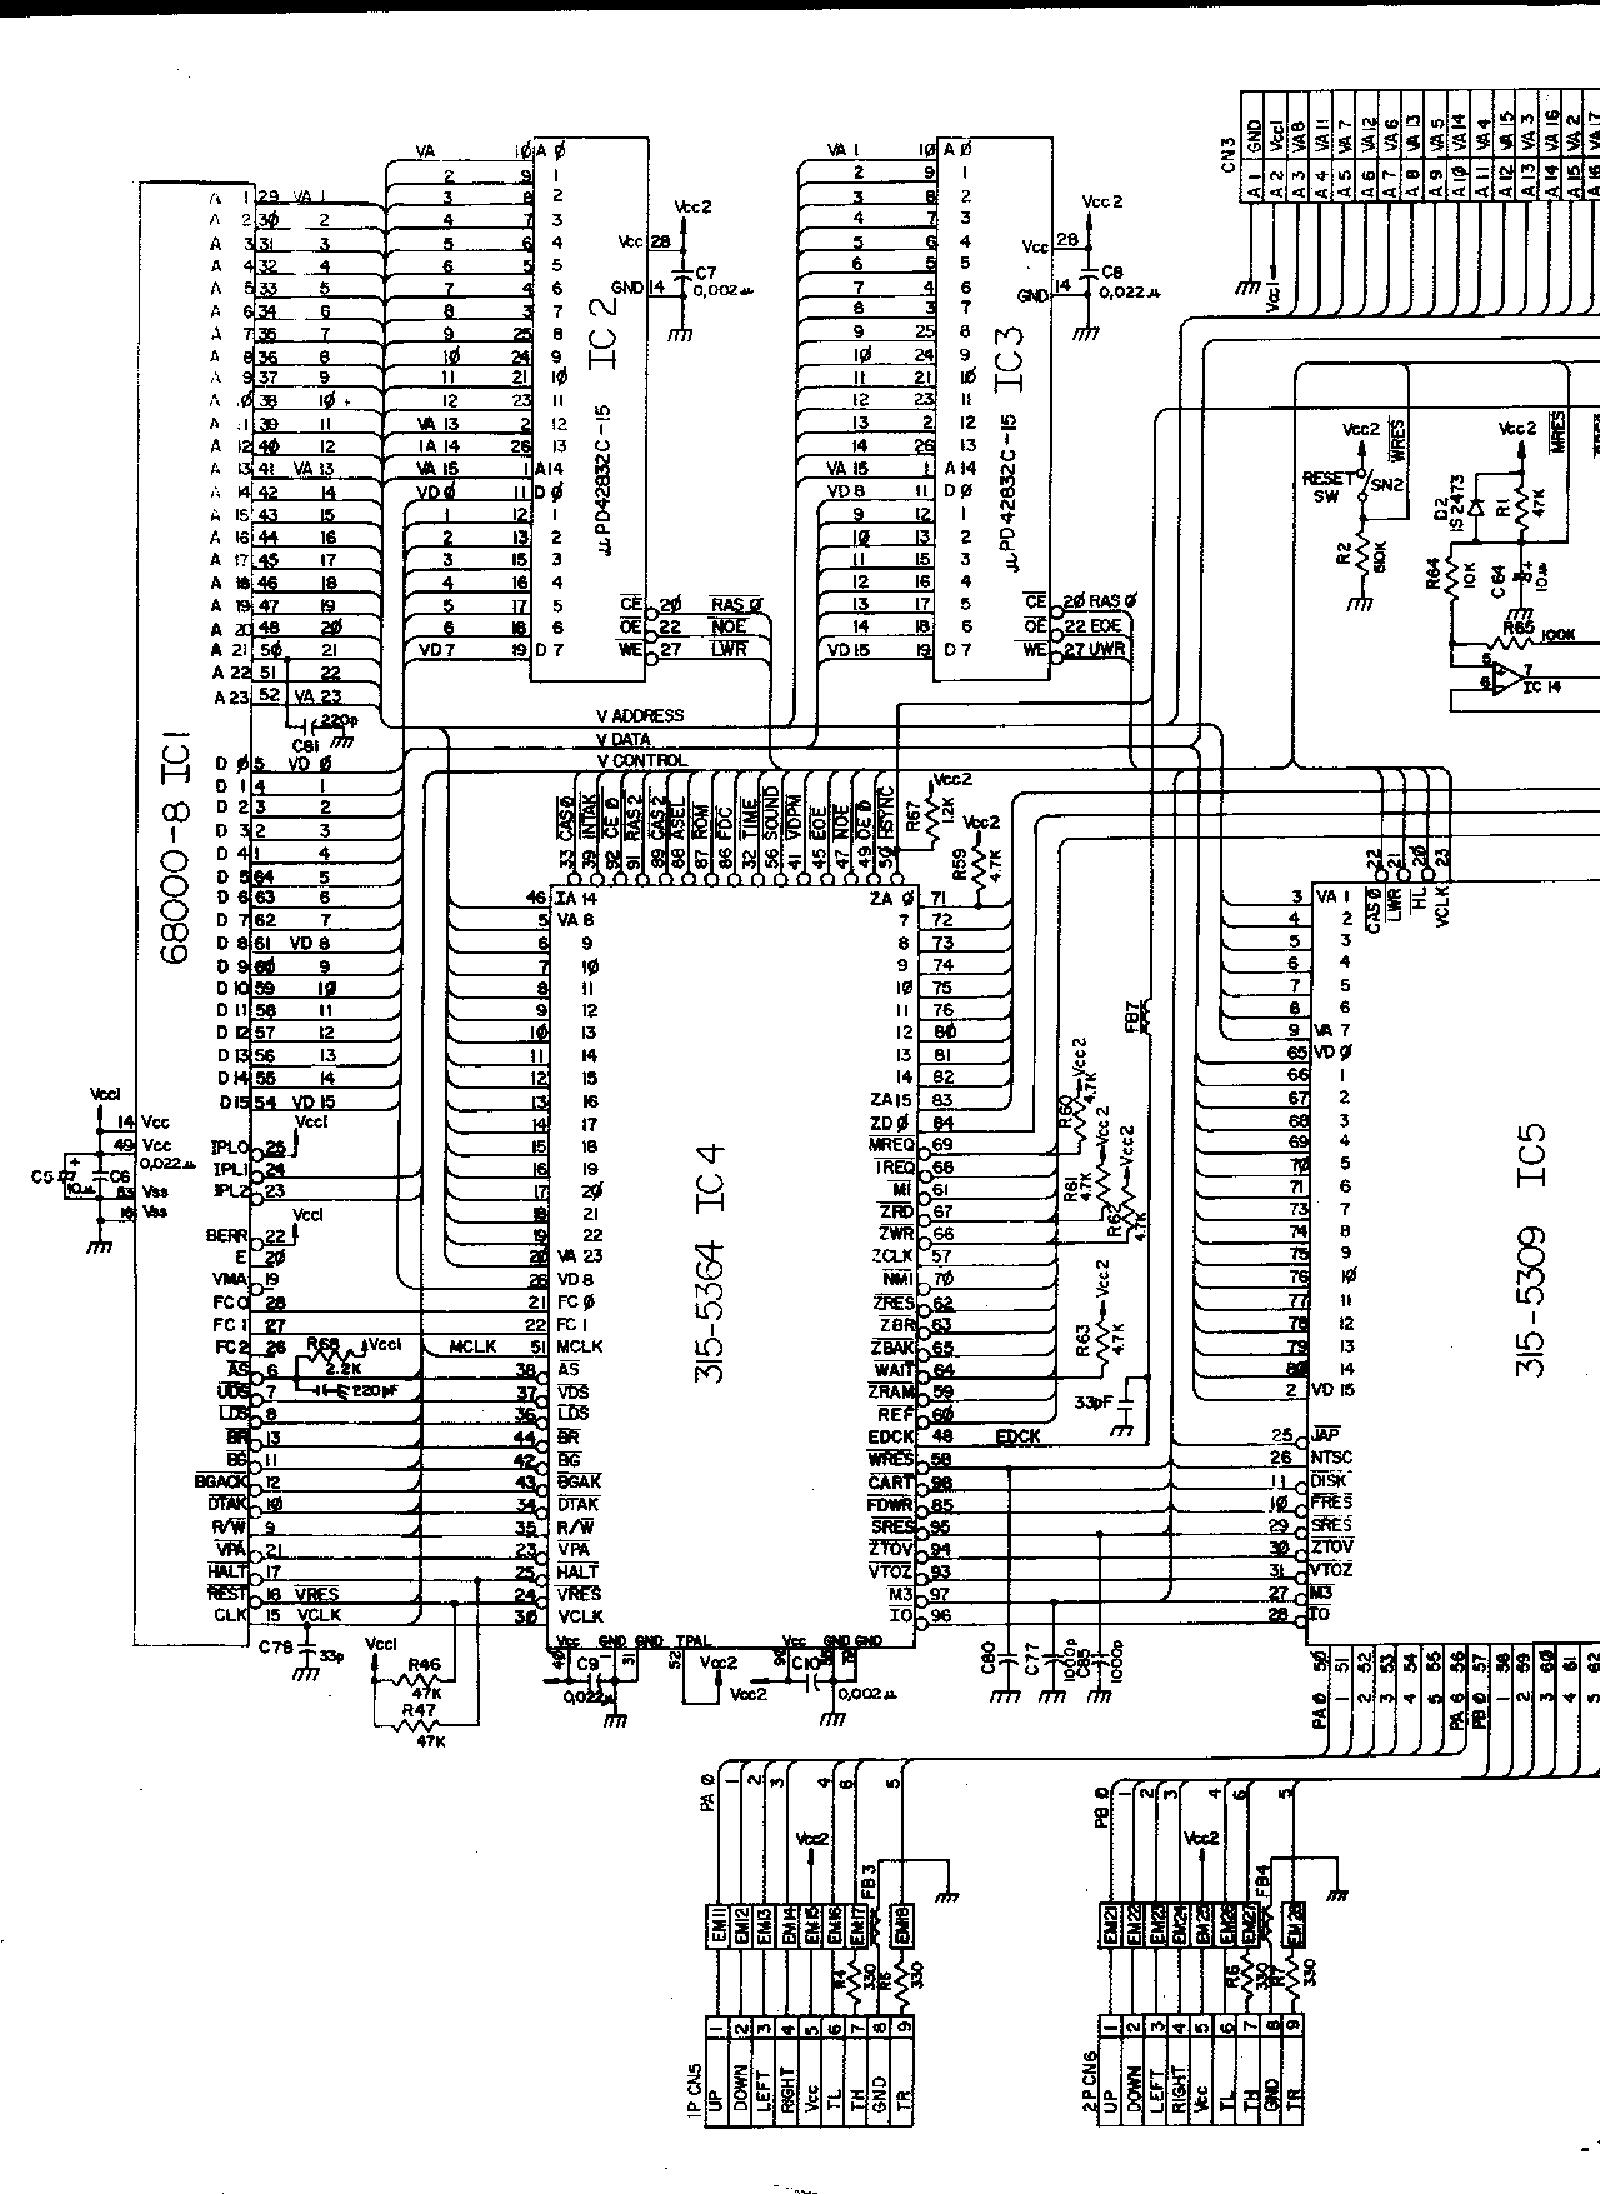 sega game gear va1 service manual download  schematics  eeprom  repair info for electronics experts